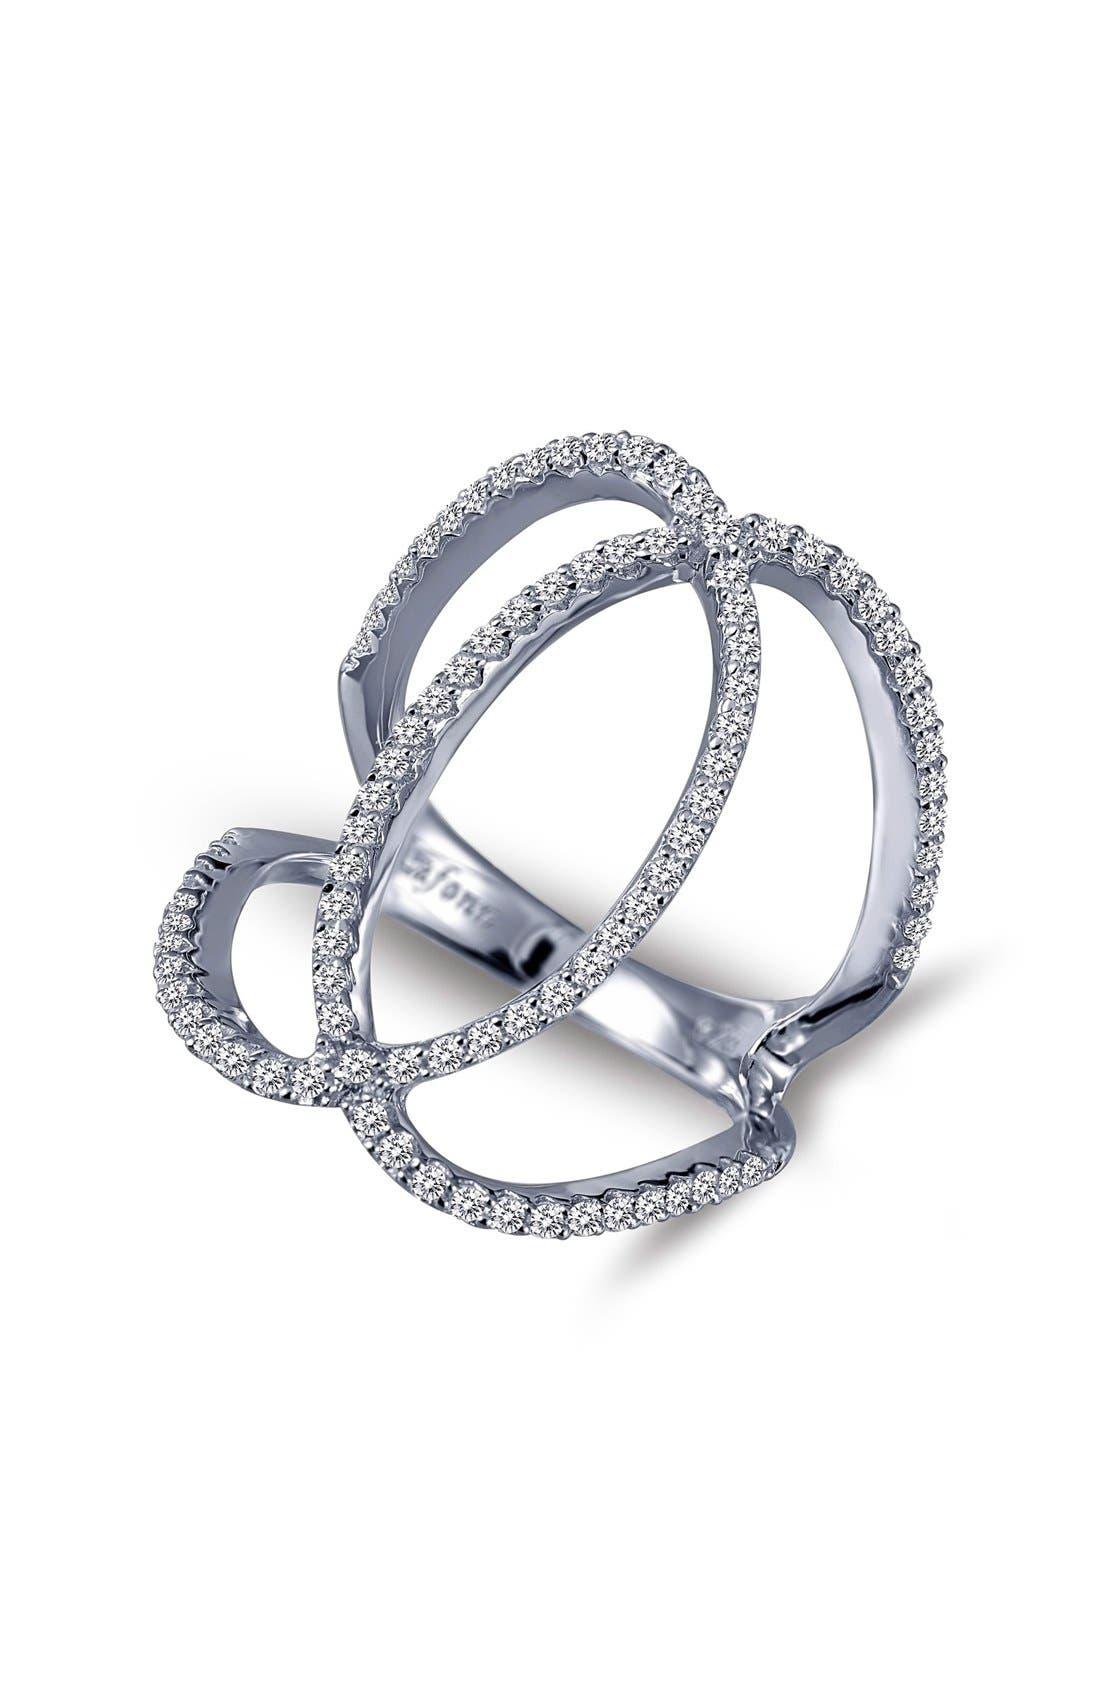 Main Image - Lafonn 'Lassaire' Openwork Ring